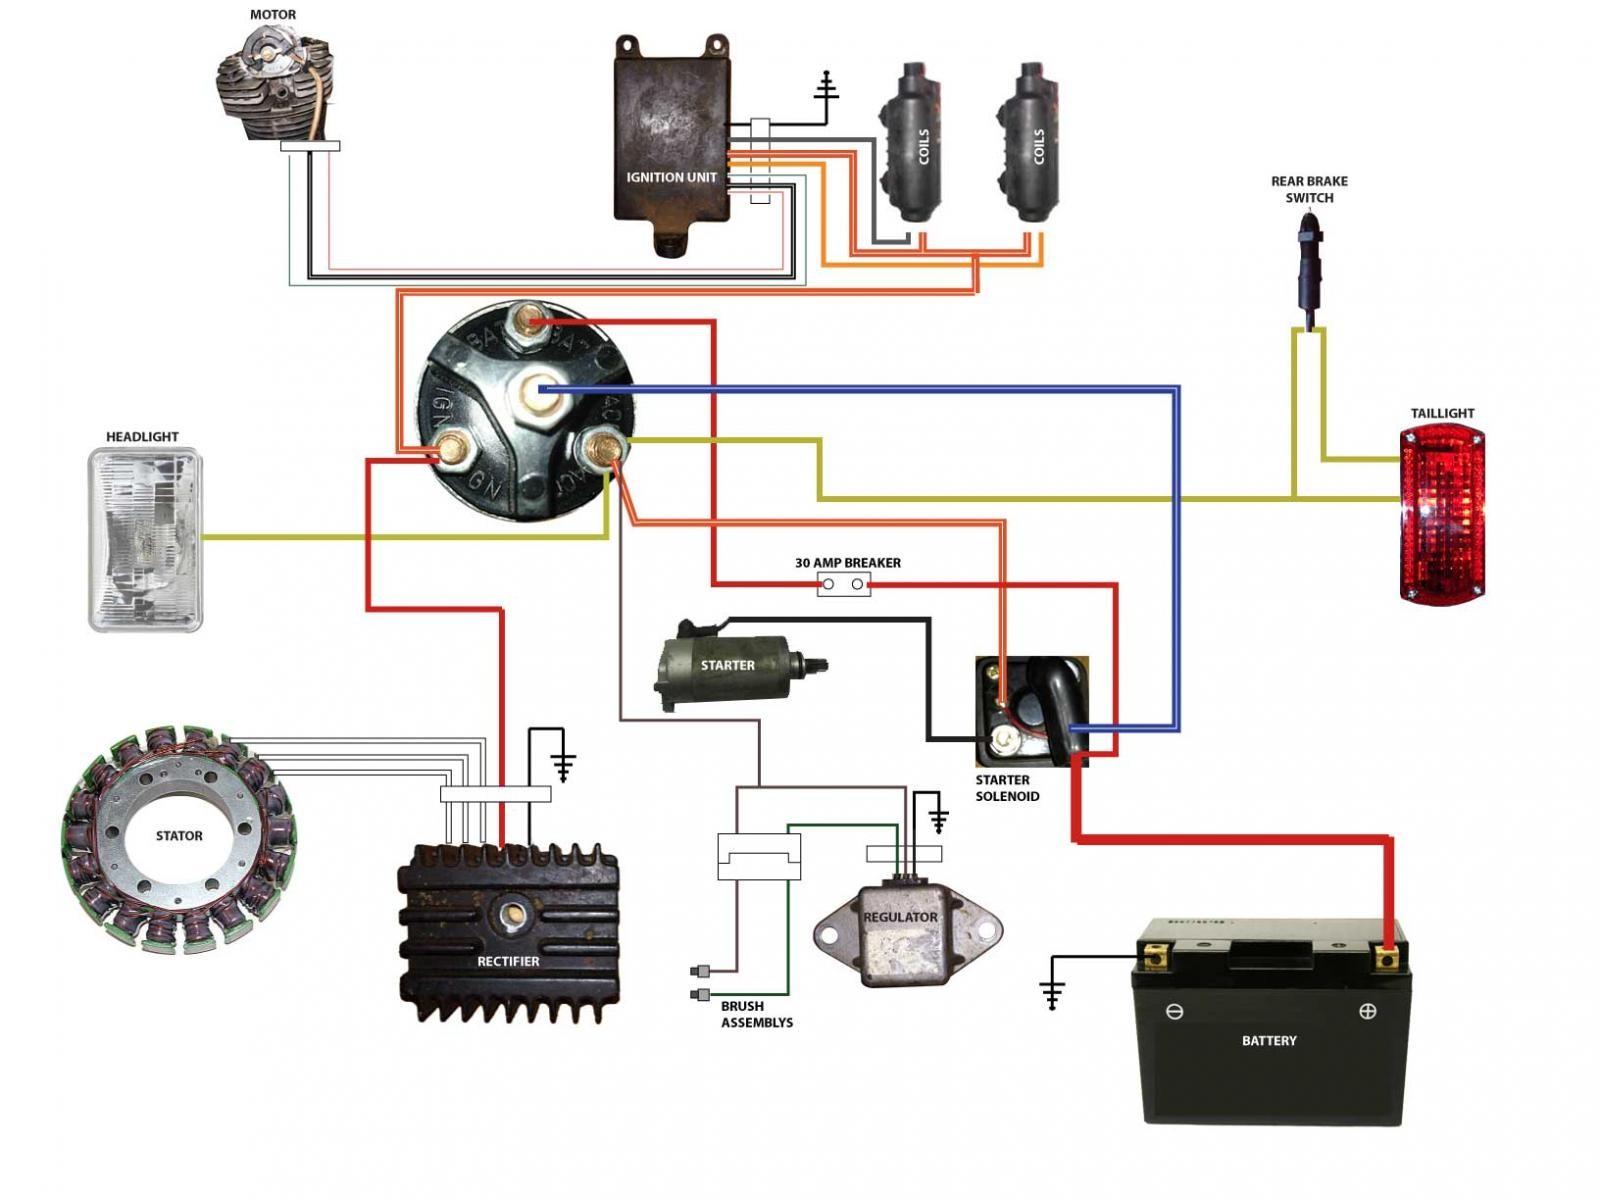 Diagram Bobber Wiring Hardkock Database Libraryharley Simple Schema